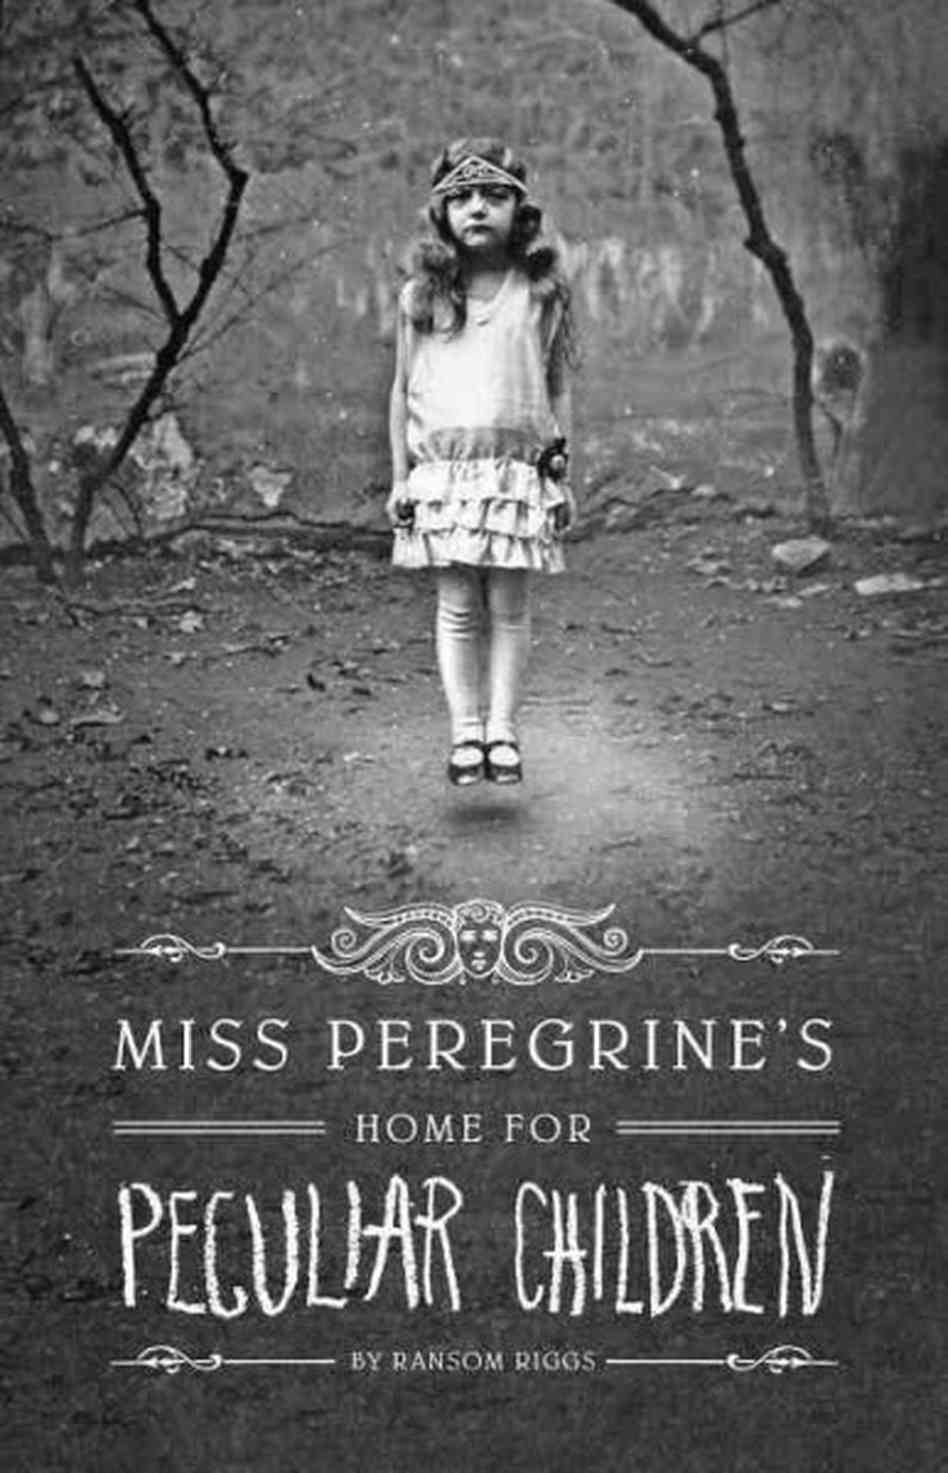 MissPeregrines.jpg